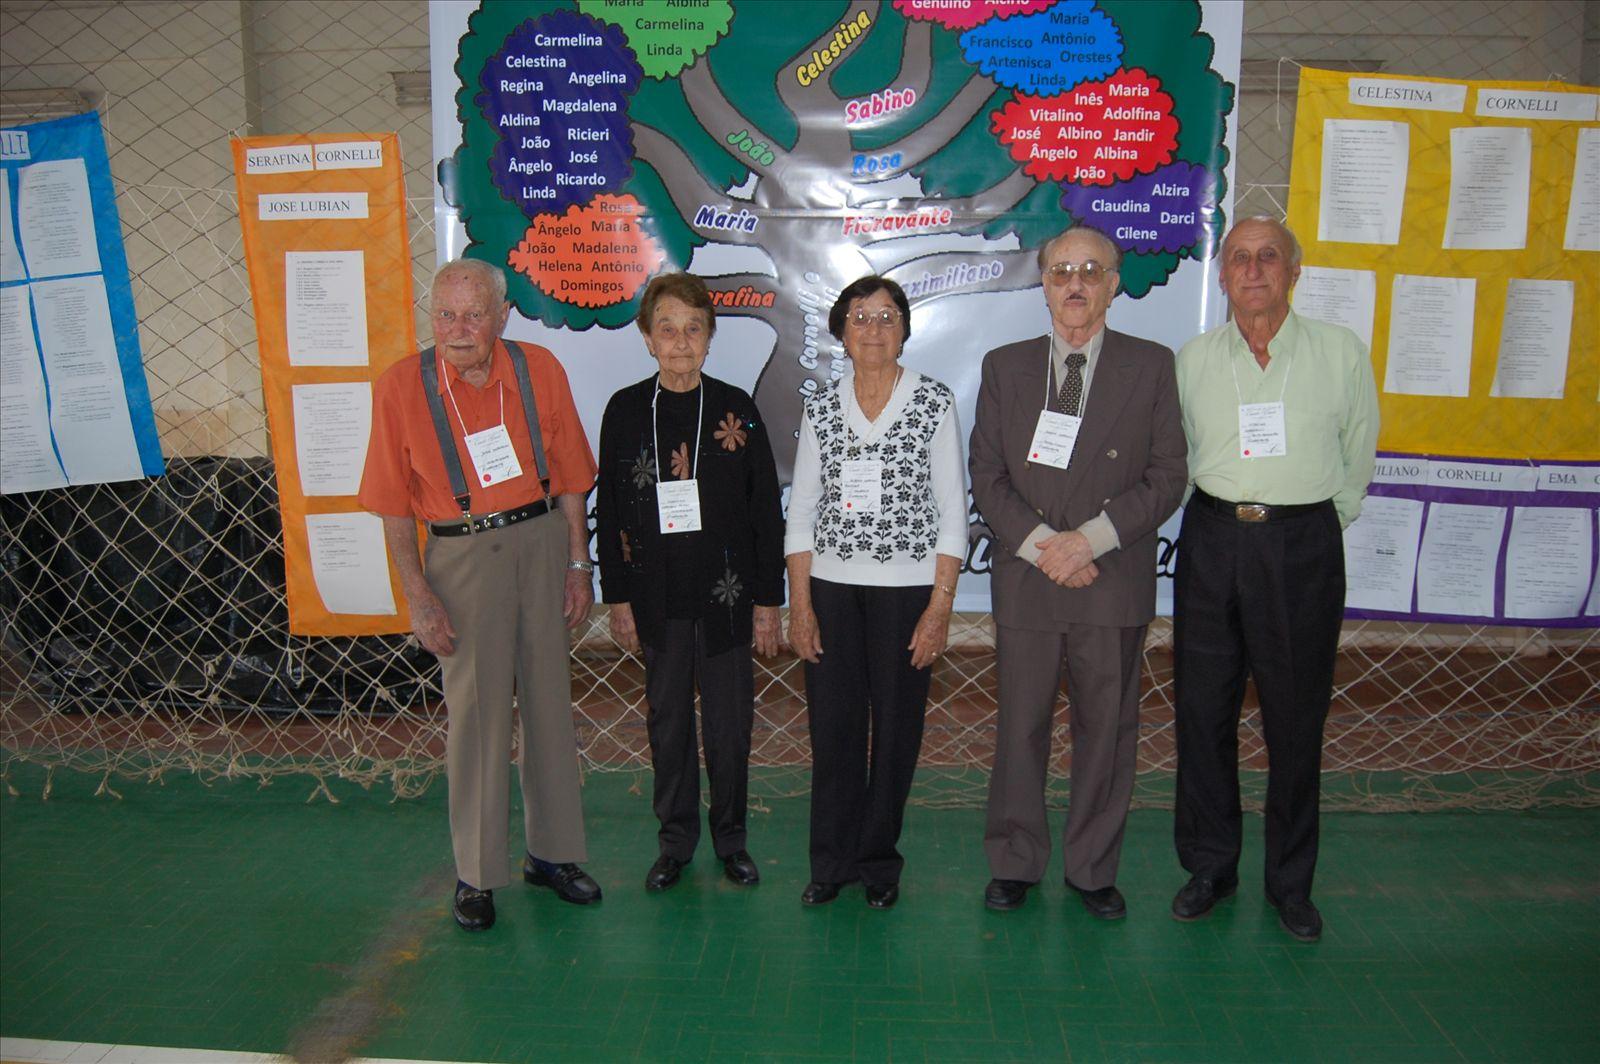 2º Encontro Família Cornelli - 11.10.2009 (196)_0